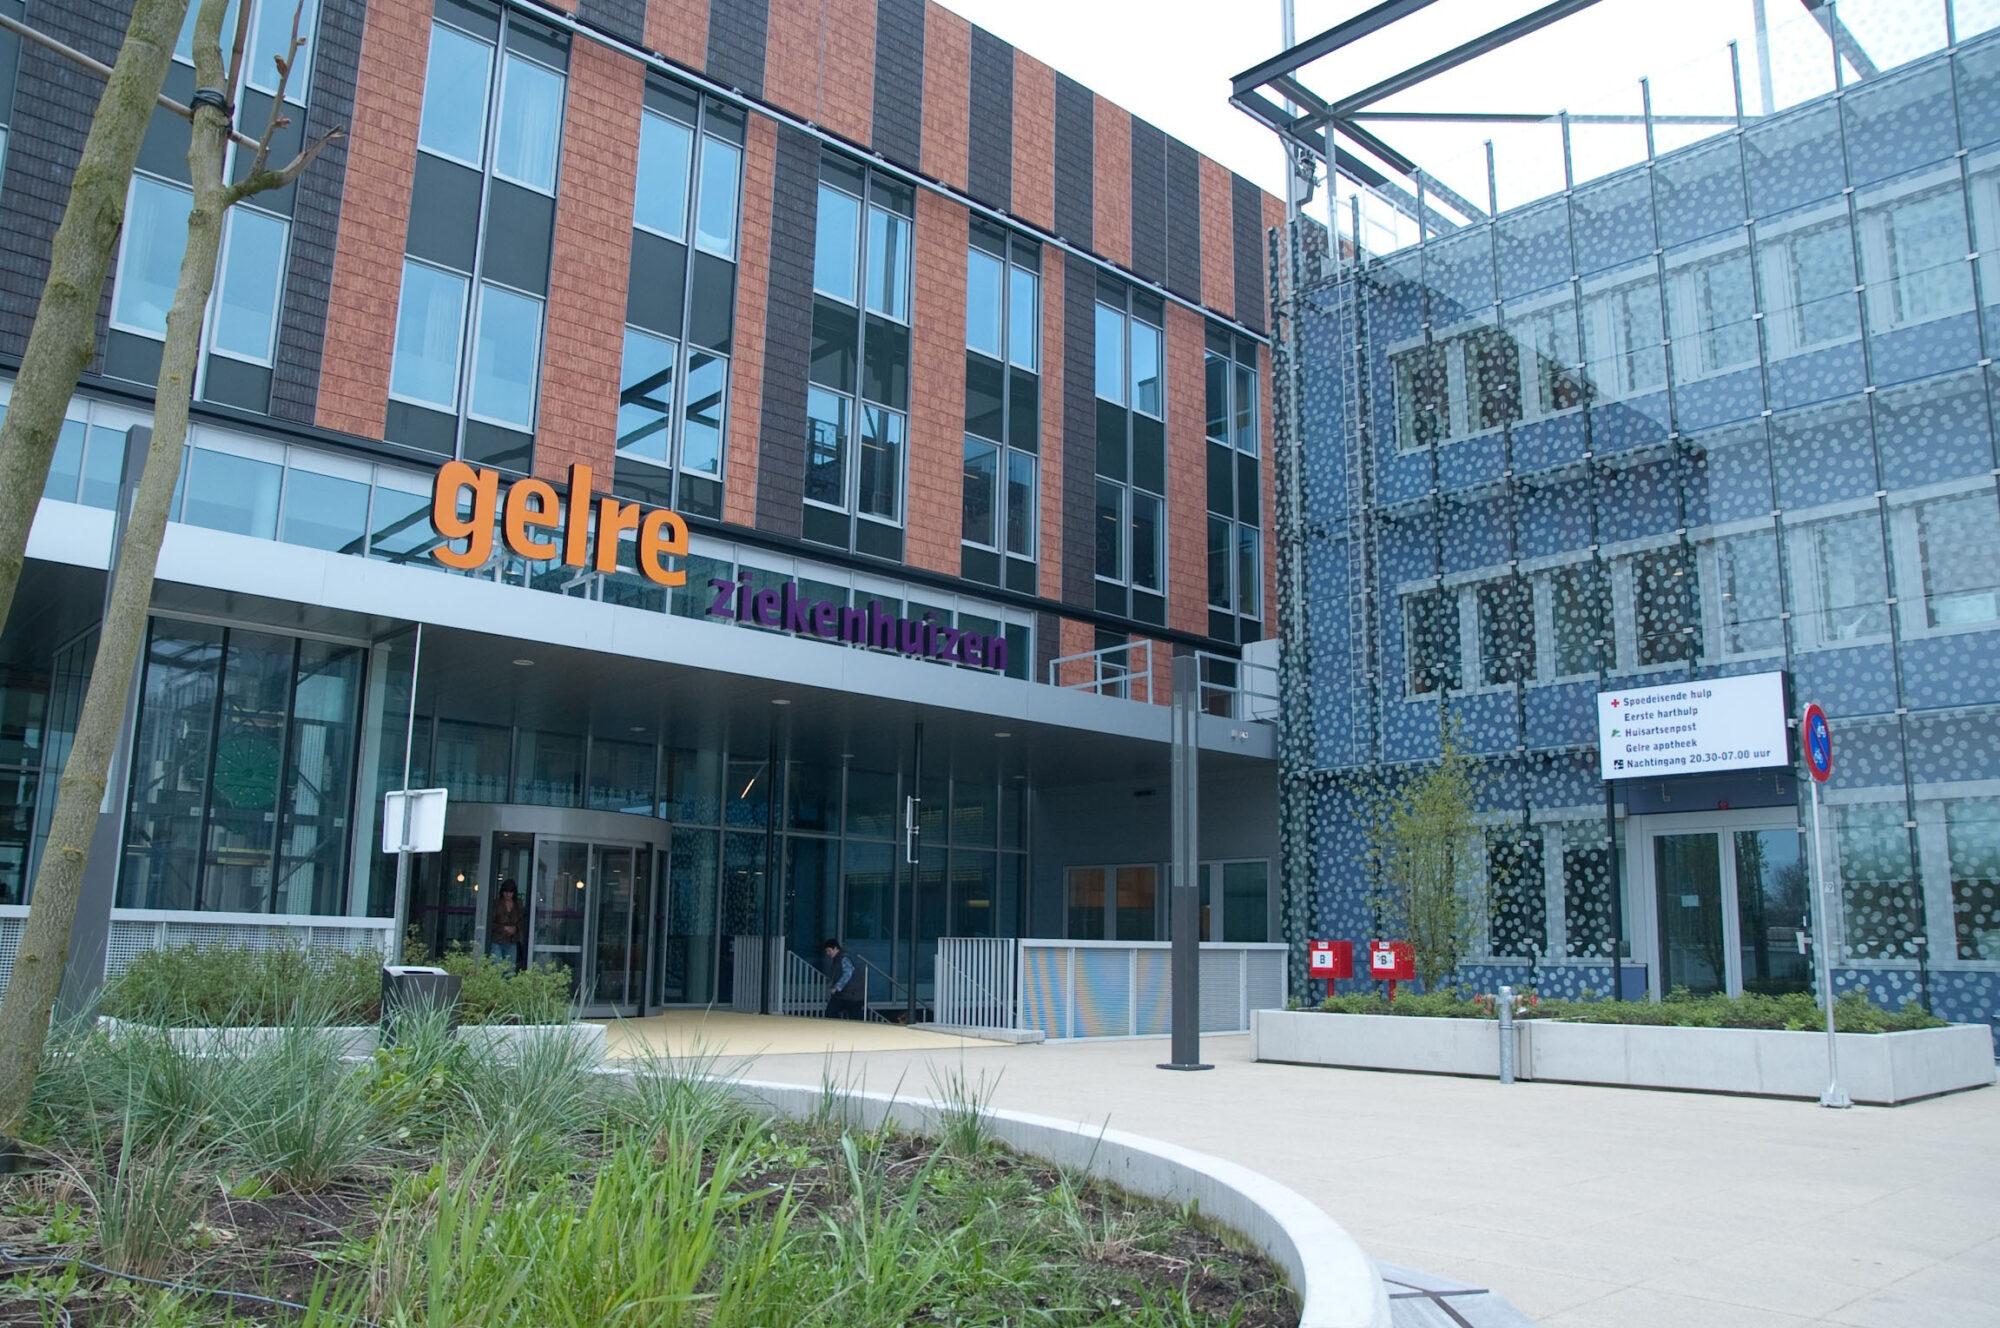 Fout met reinigen instrument in Gelre Ziekenhuizen Zutphen